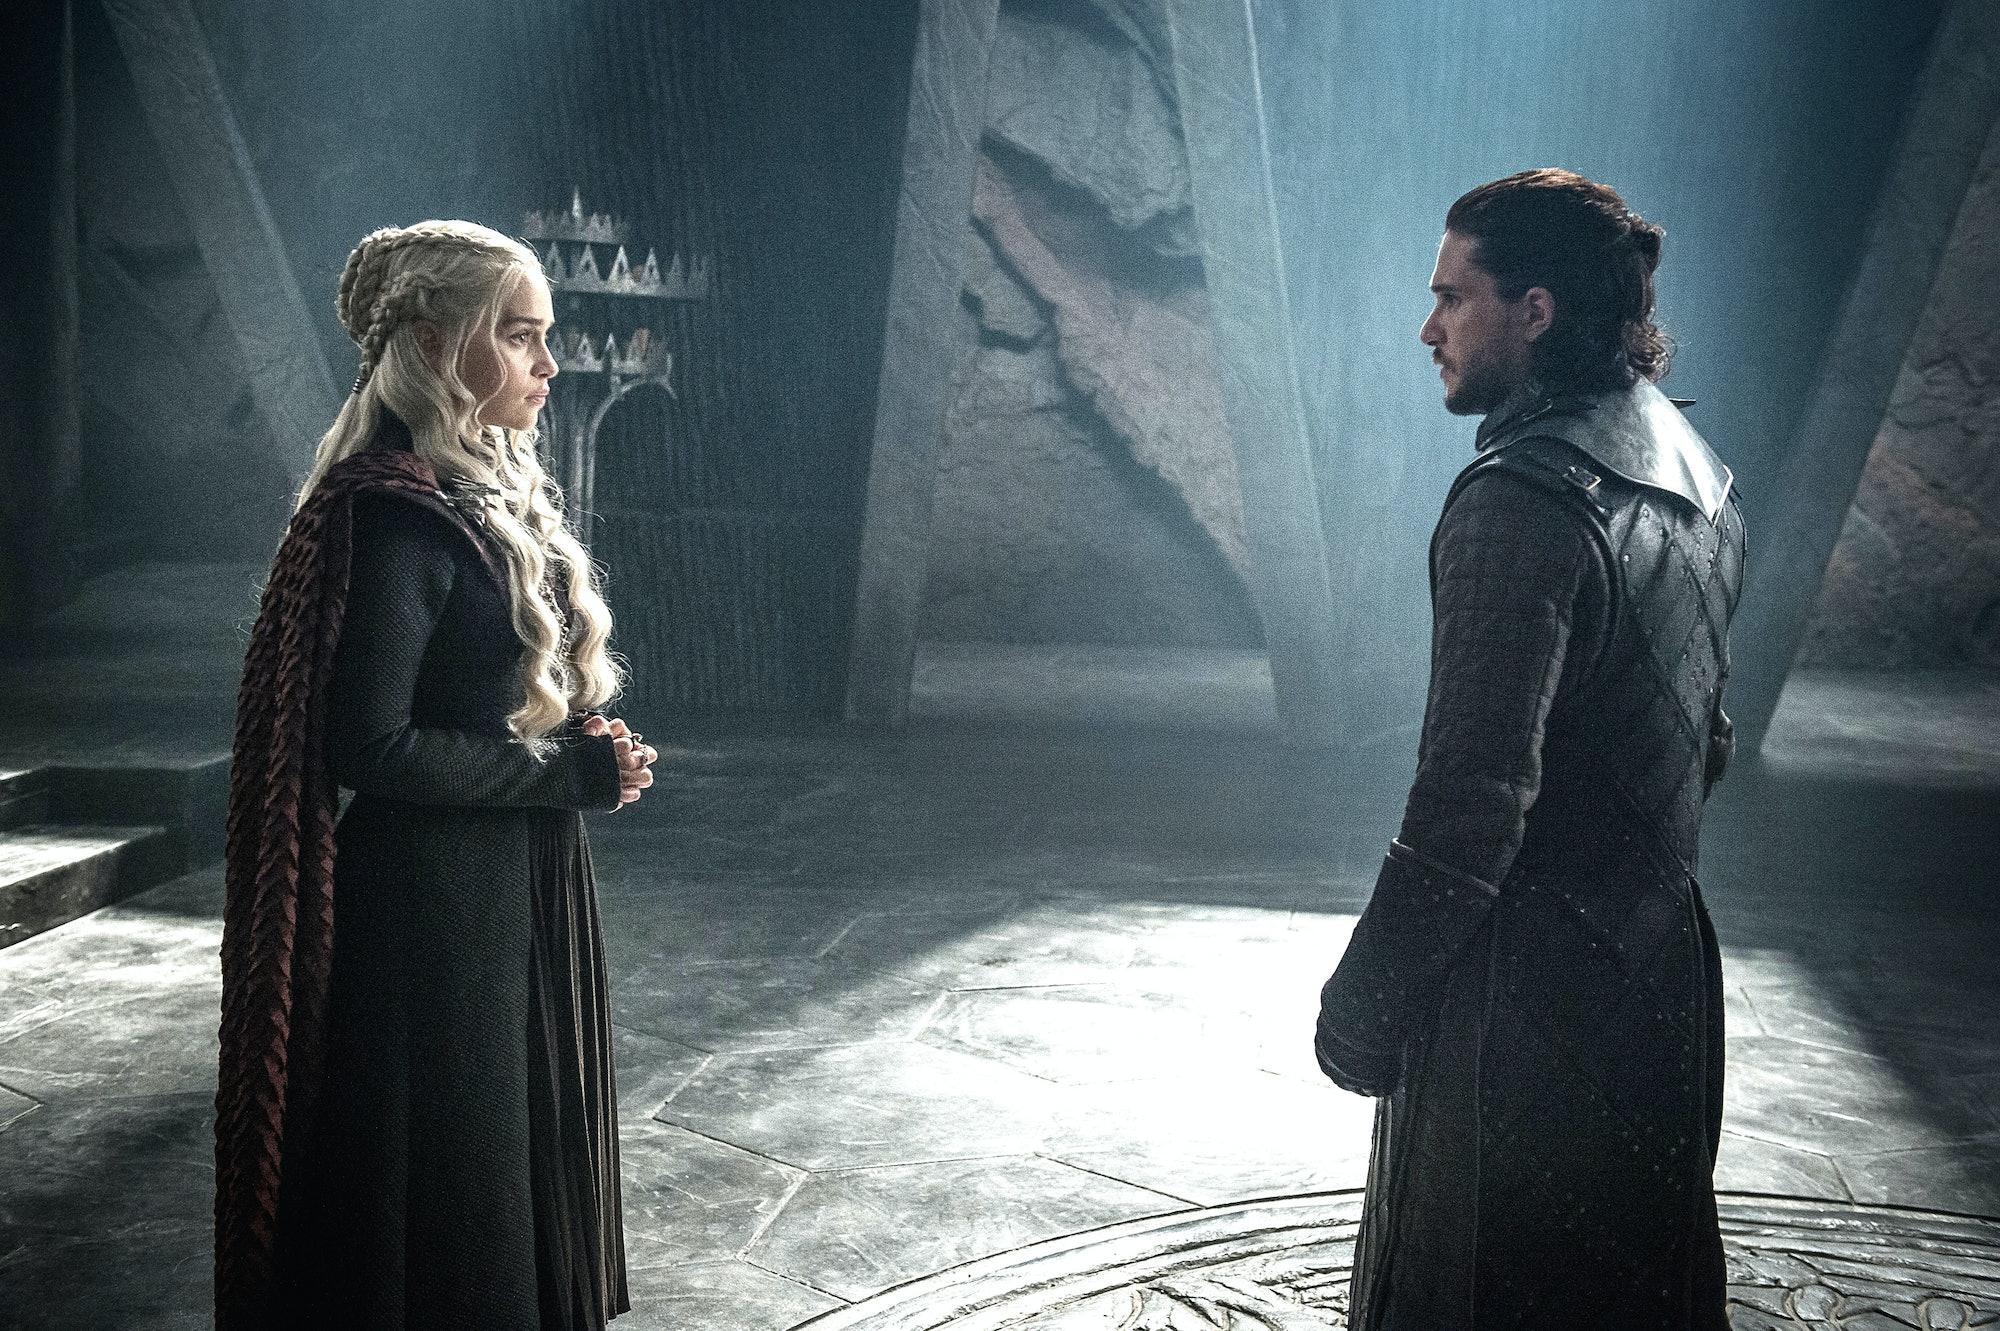 Kit Harington as Jon Snow and Emilia Clarke as Daenerys Targaryen